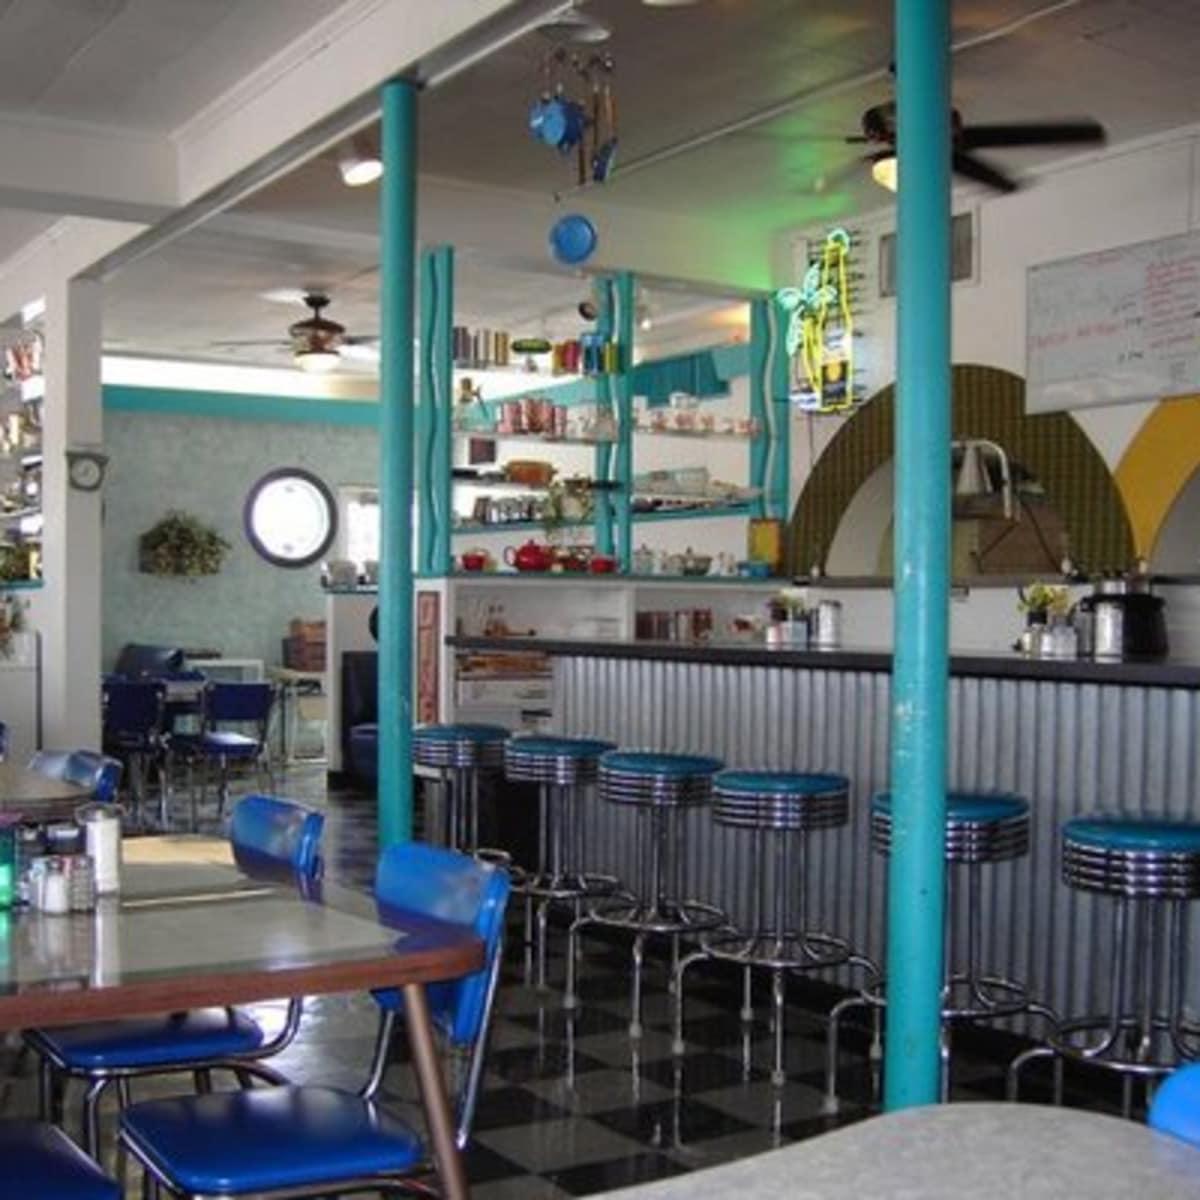 Austin Photo: Places_food_austin diner interior